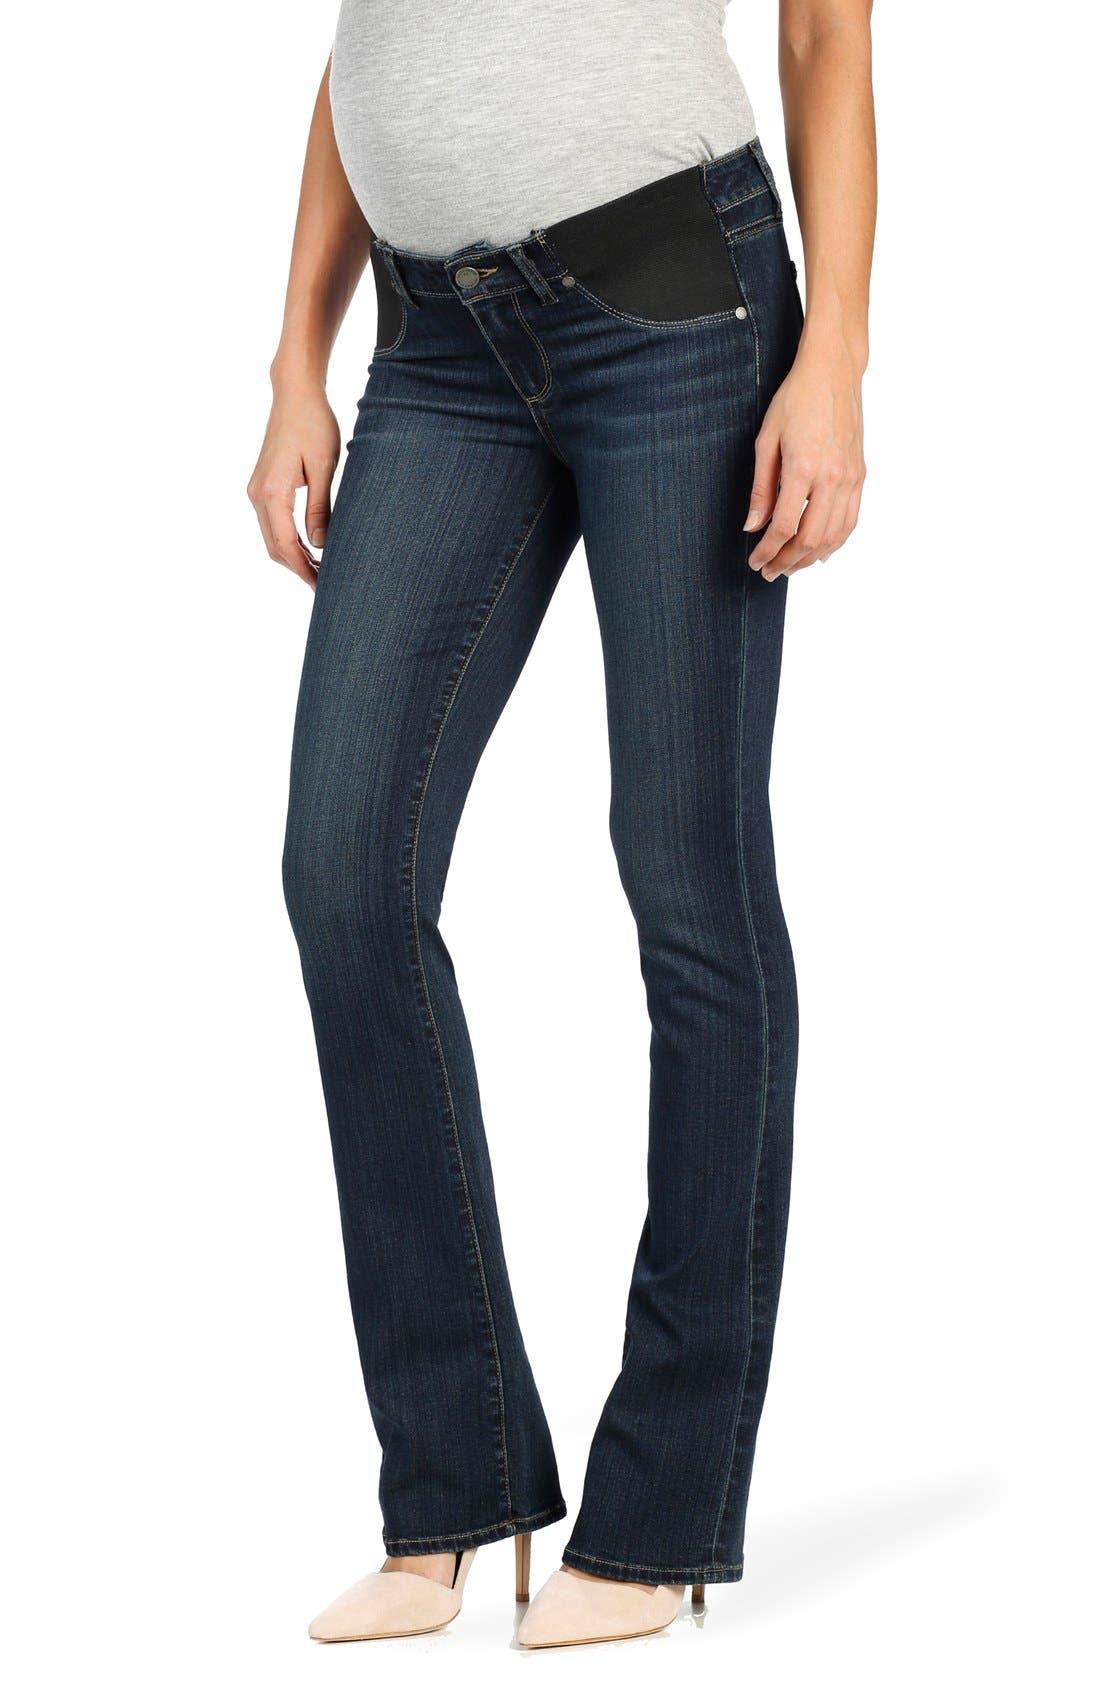 Next bootcut maternity jeans